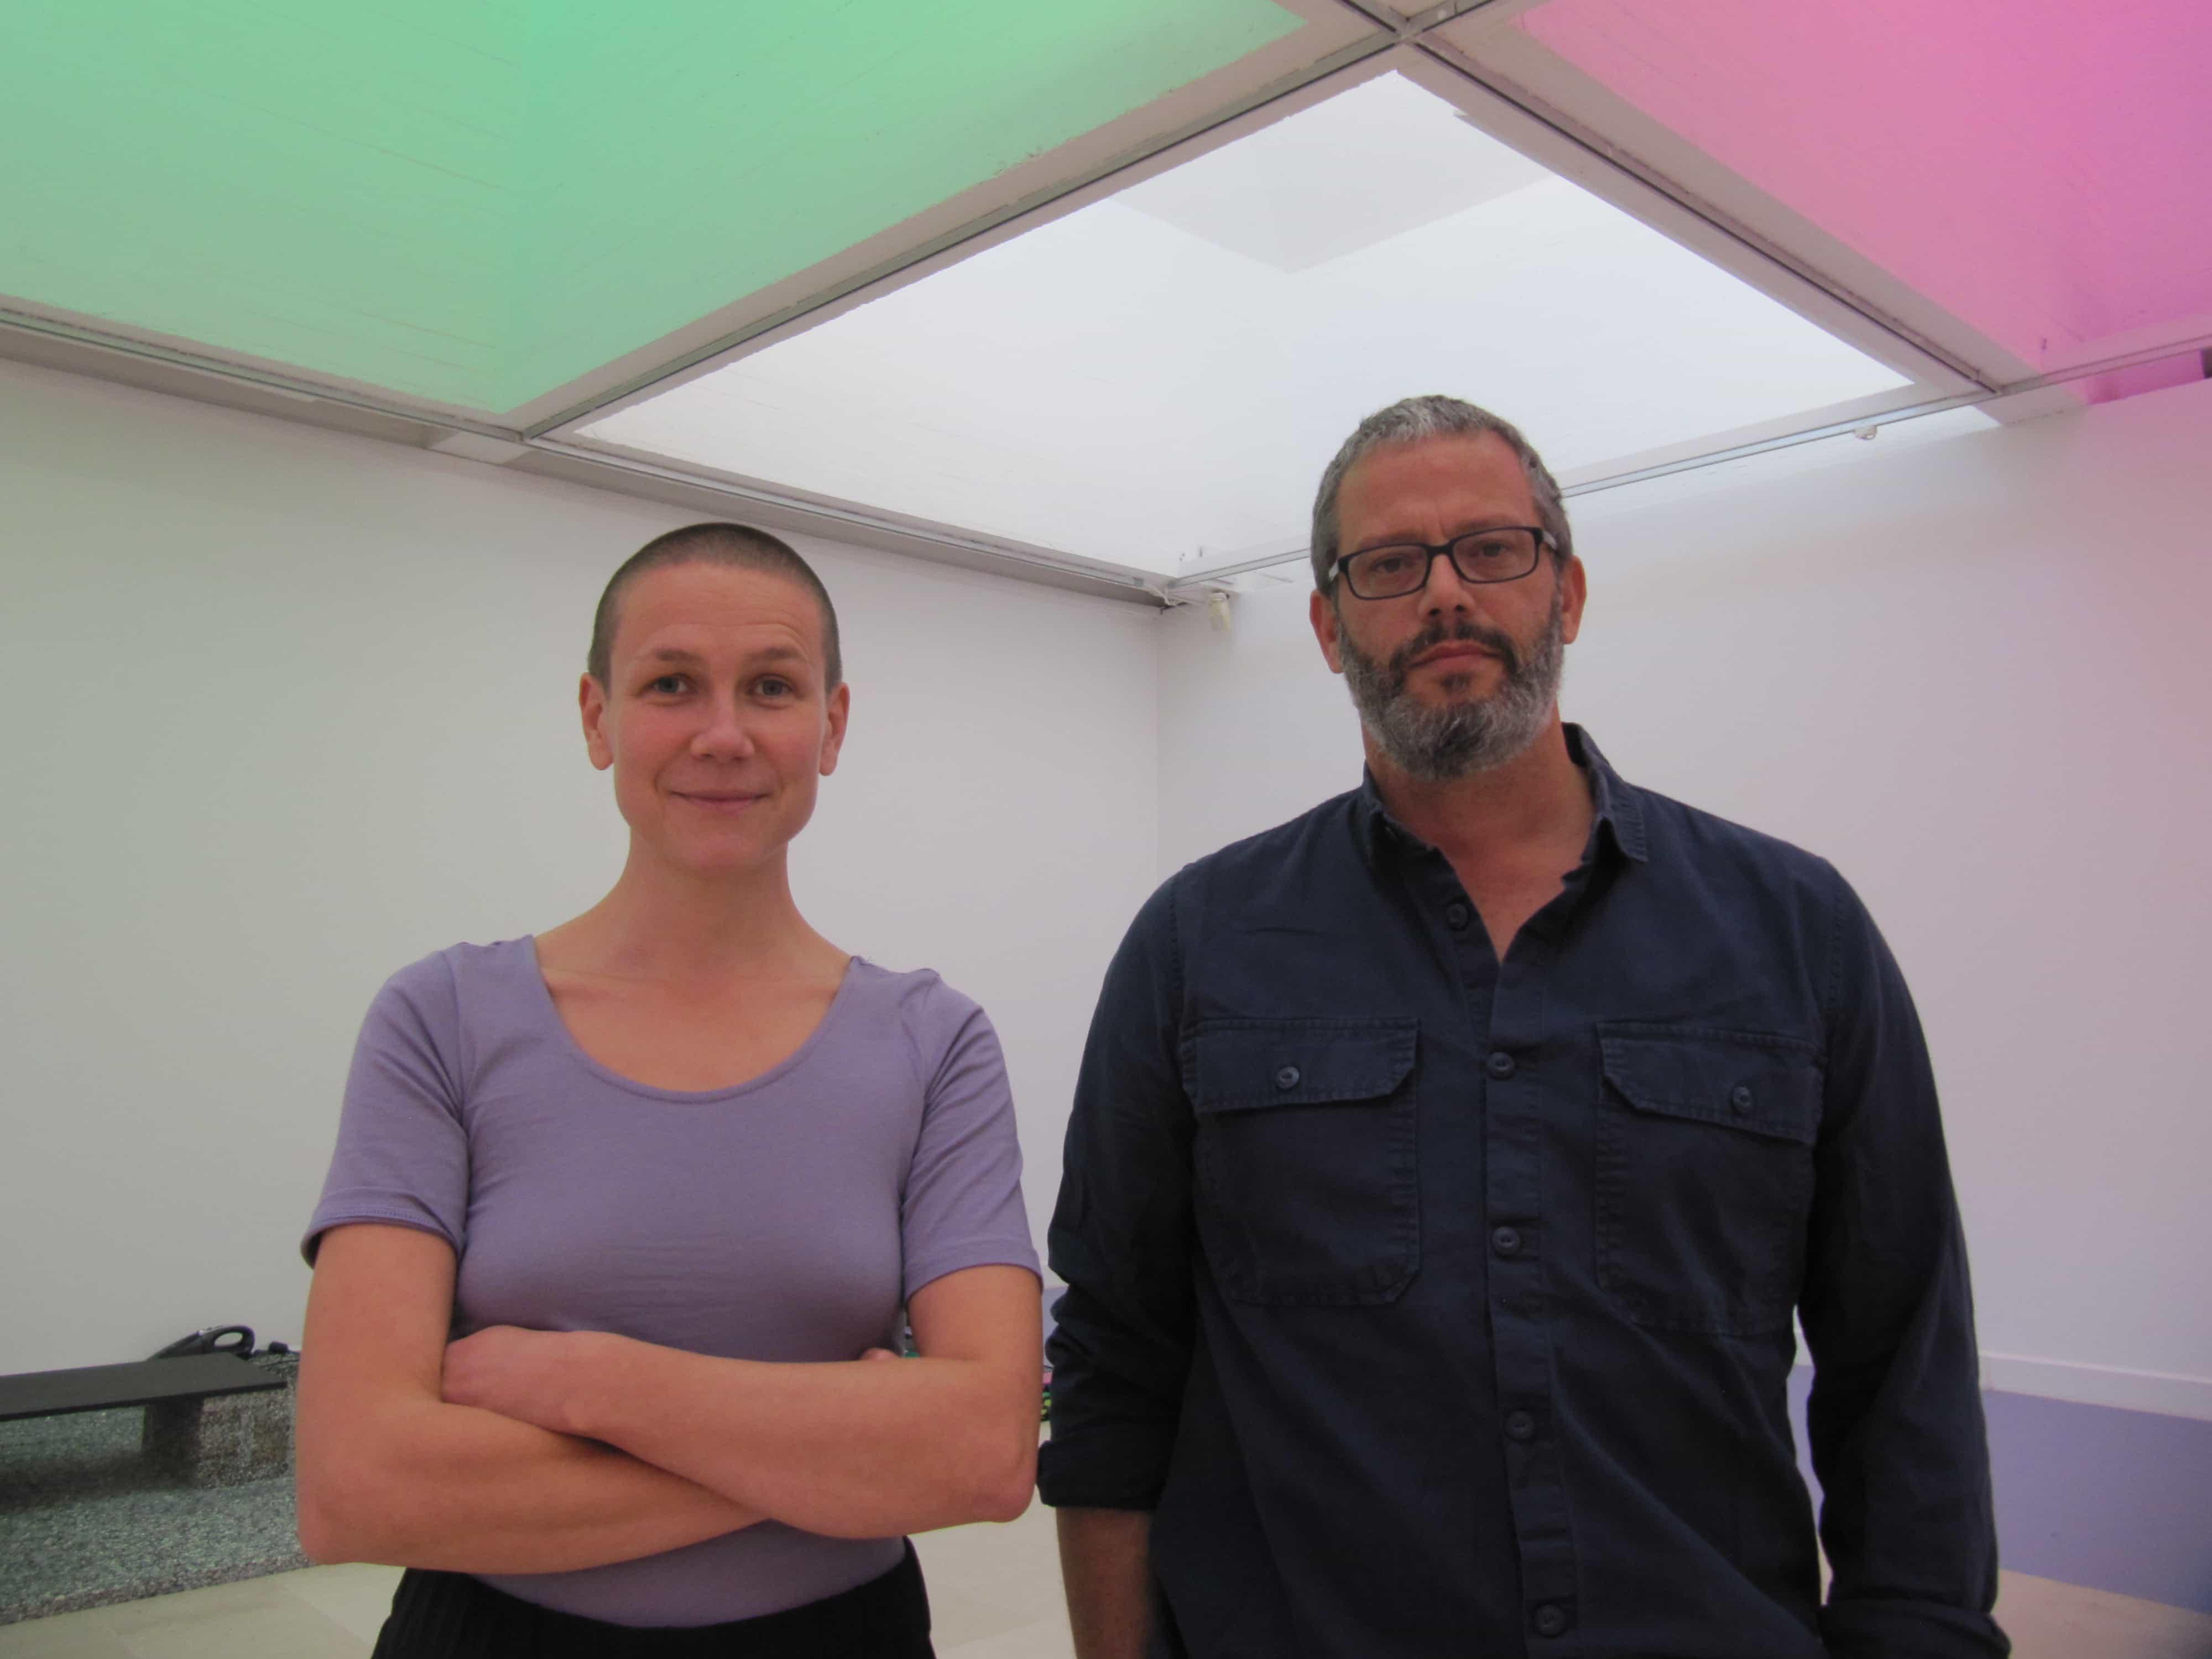 Violaine Lochu et Joao Fiadeiro - Photo Villa Arson